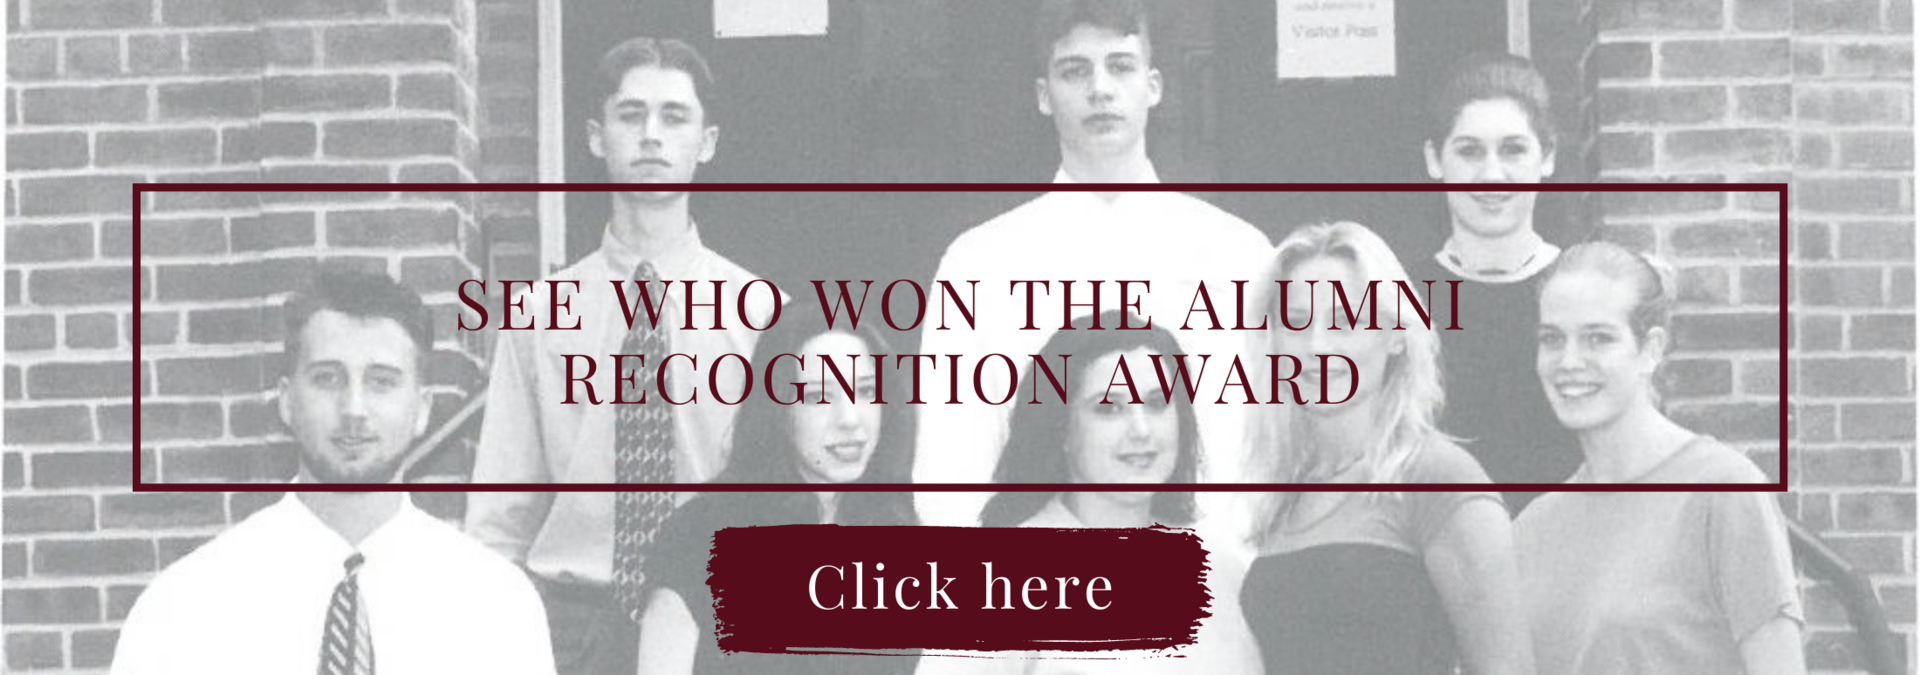 Alumni Recognition Award